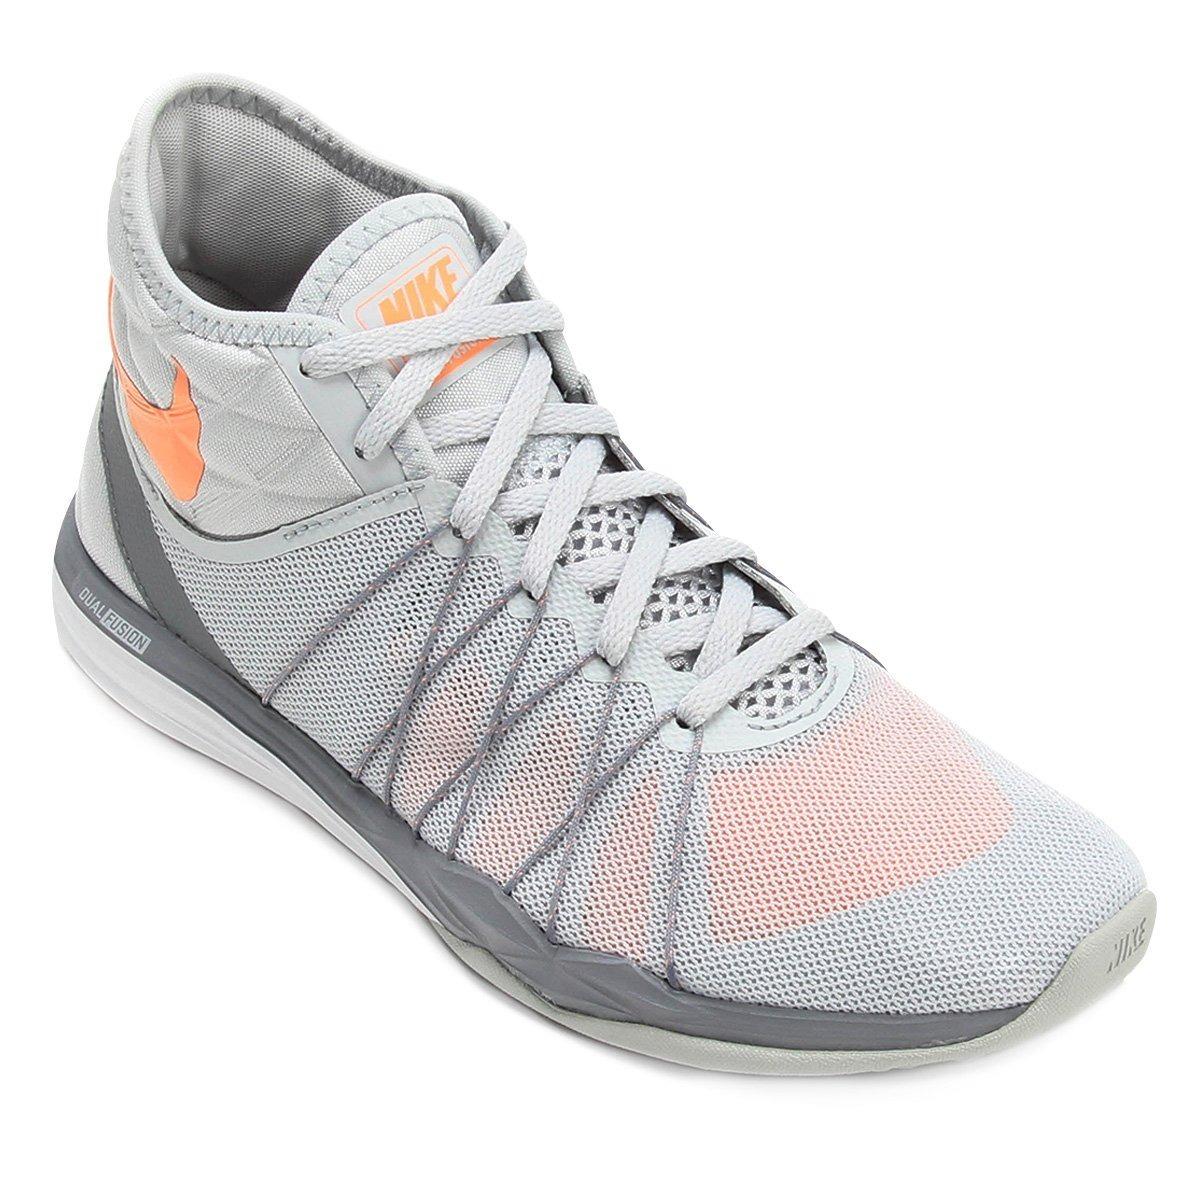 f4be77c0056 tênis nike dual fusion tr hit feminino - cinza e laranja. Carregando zoom.